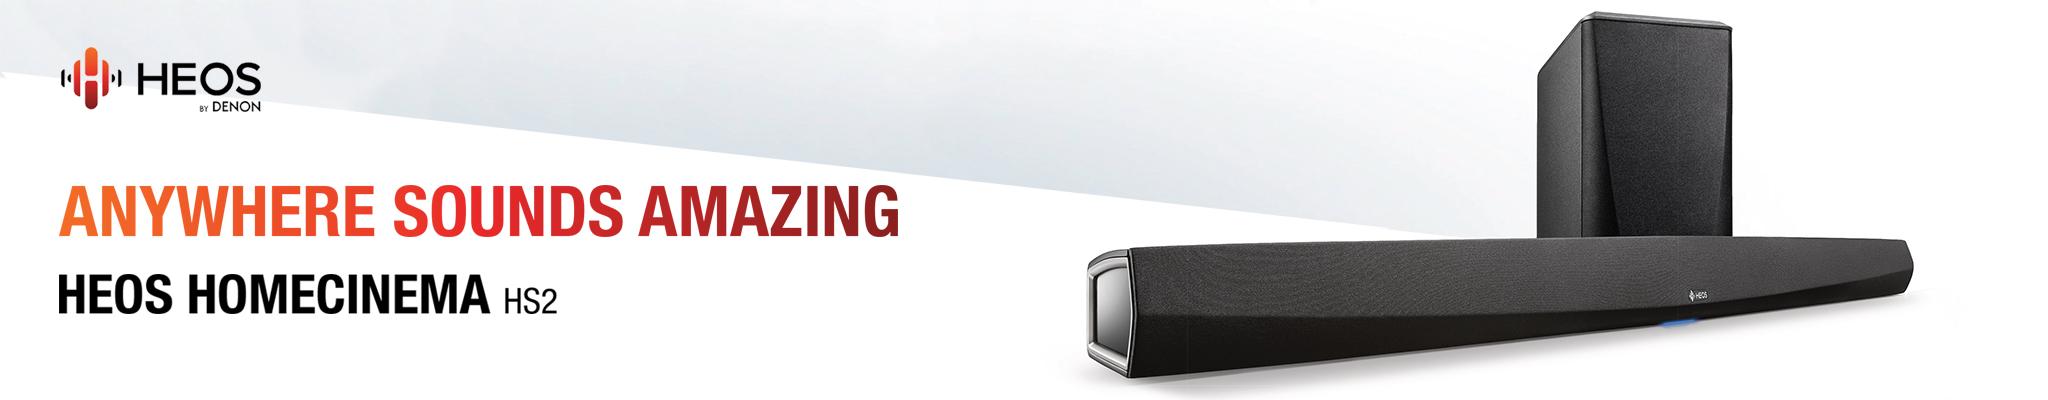 HEOS By Denon | HEOS HomeCinema S2 4K - Online Hi-Fi | NZ | Hi-Fi Audio